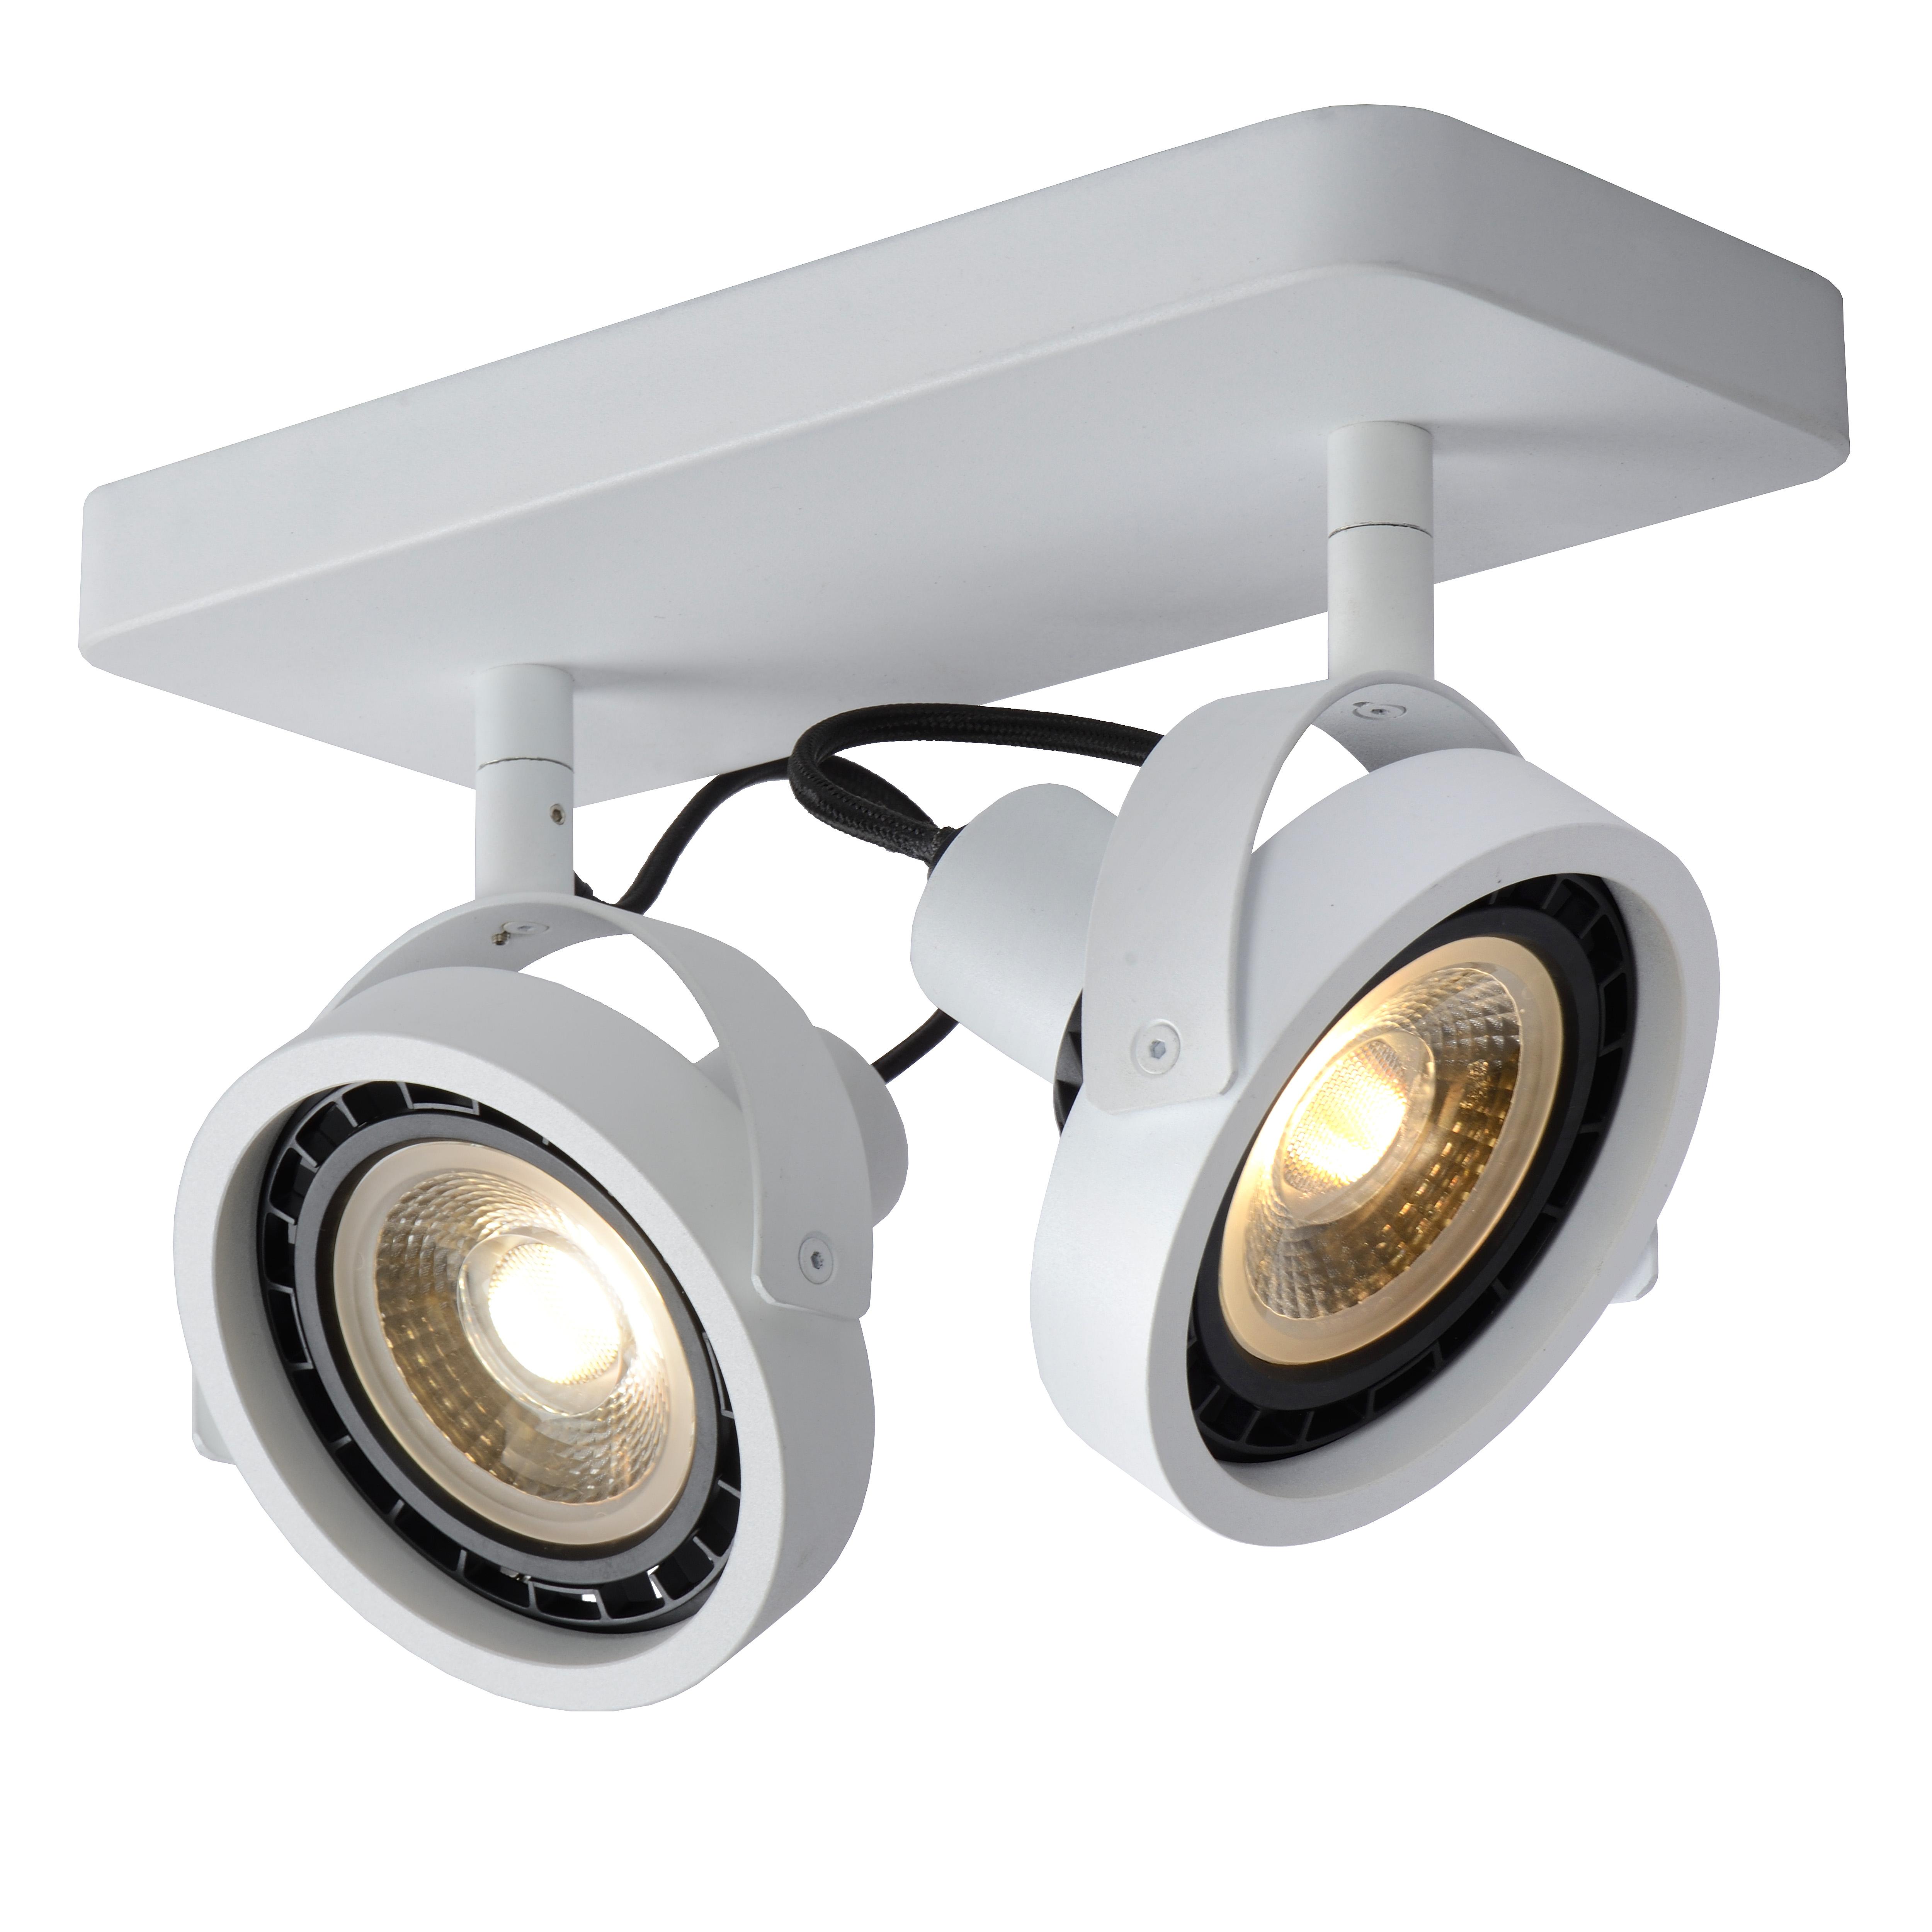 TALA LED   Deckenstrahler   LED Dim to warm   GU10   2x12W 2200K/3000K   Weiß